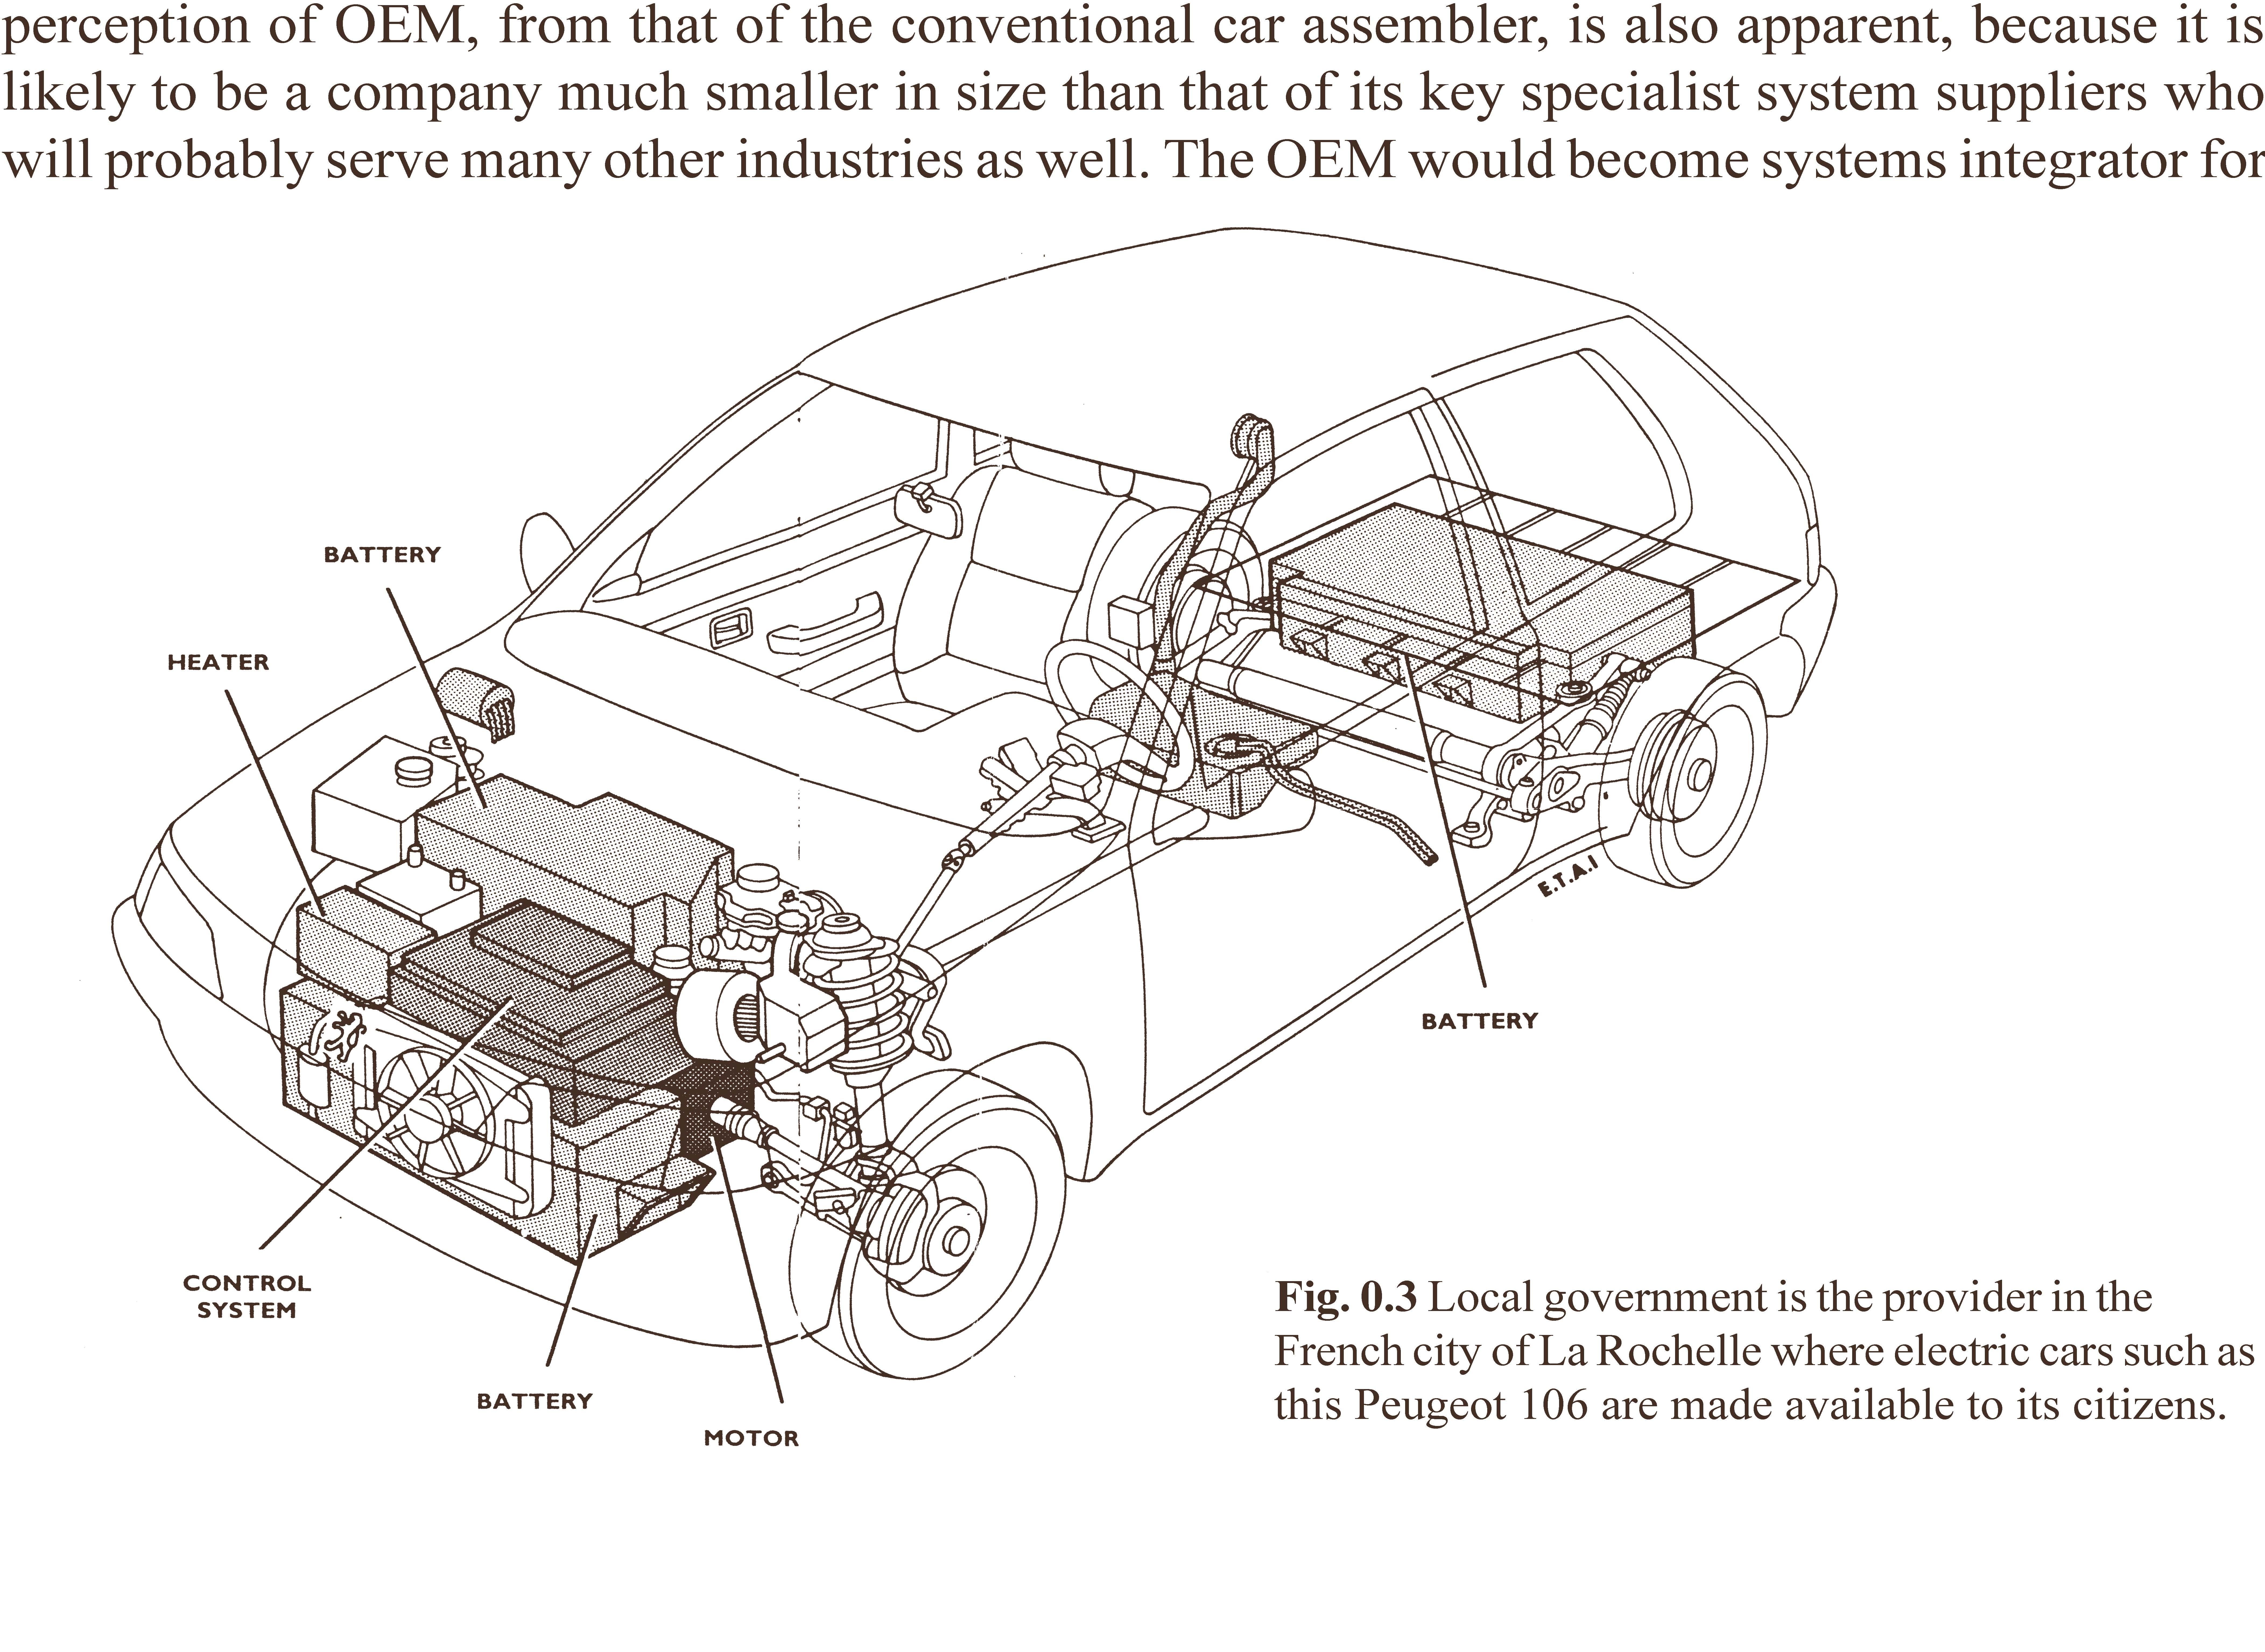 Full Car Engine Diagram 4 Cylinder sel Engine Diagram ...  Cylinder Car Engine Diagram on